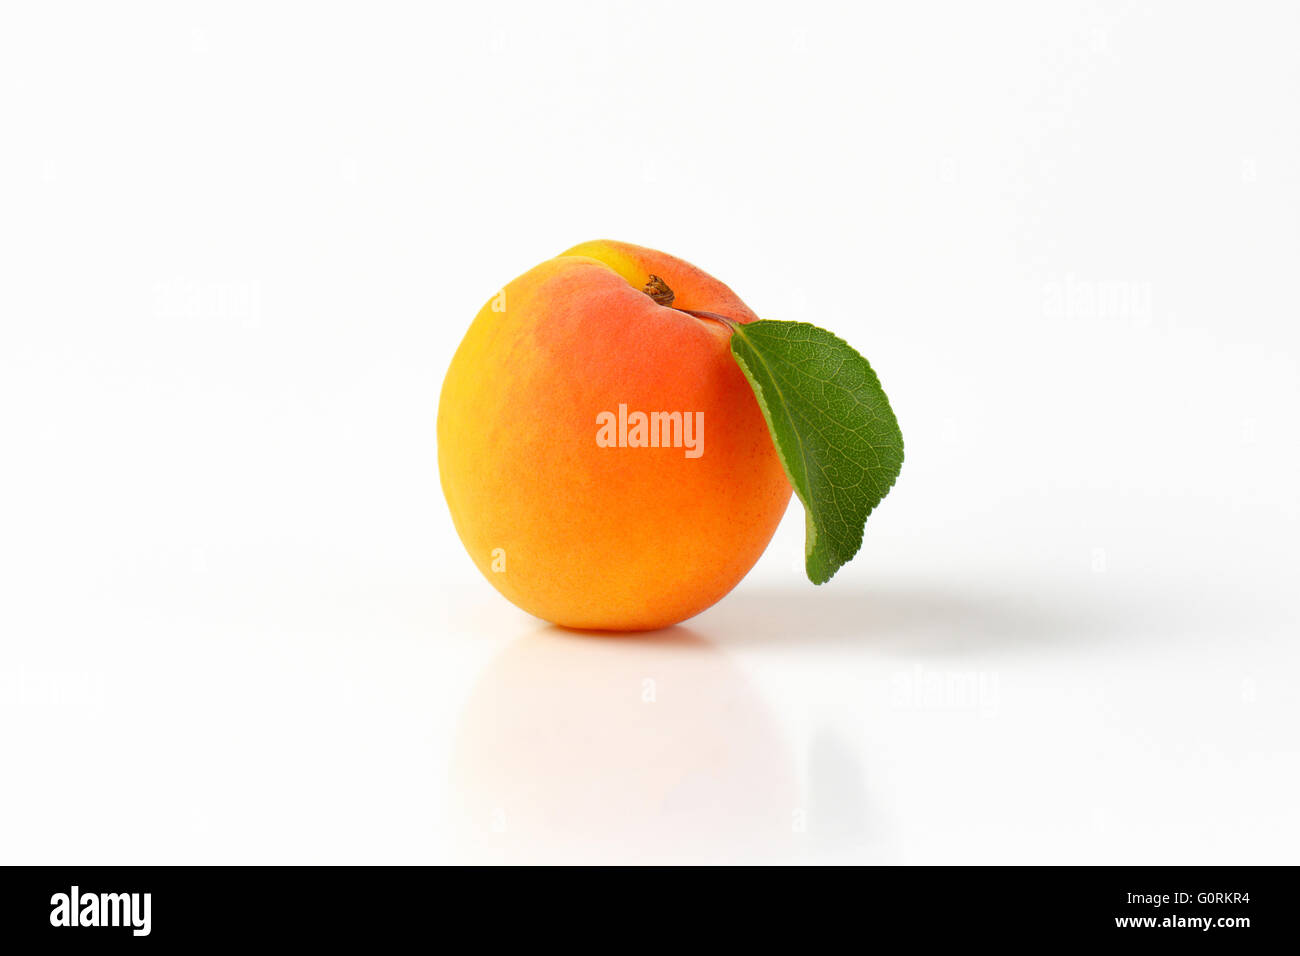 Fresh apricot on white background - Stock Image